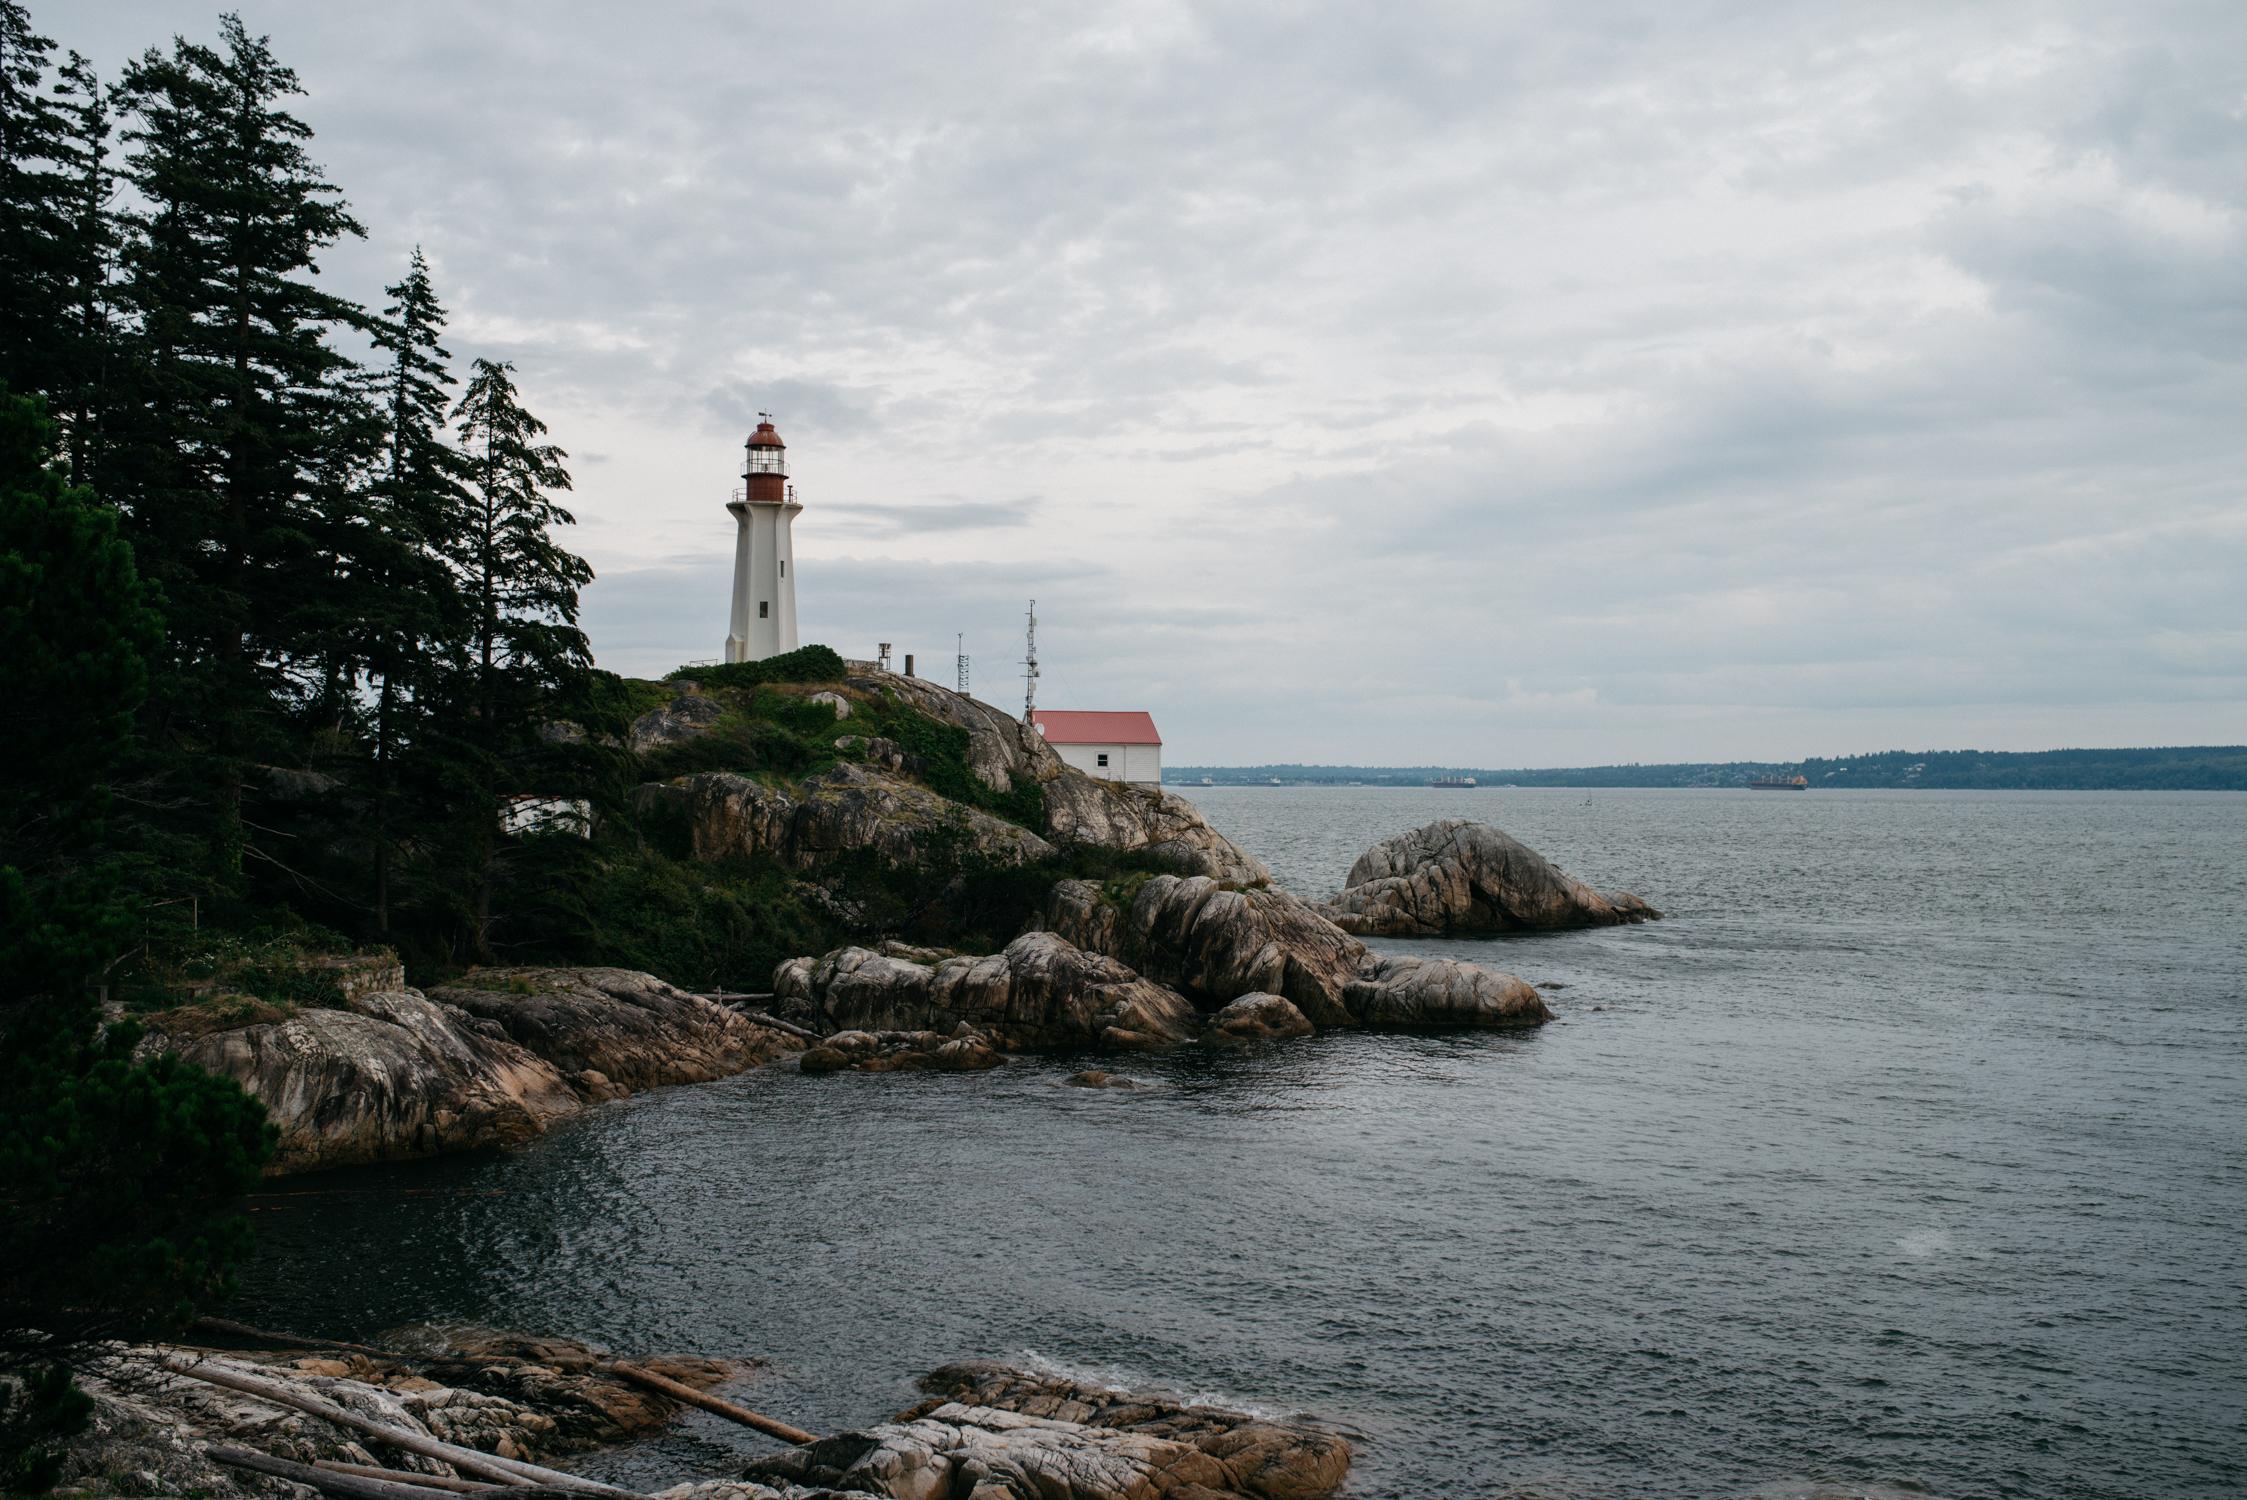 017_Lighthouse_Park_Engagement_Vancouver.jpg